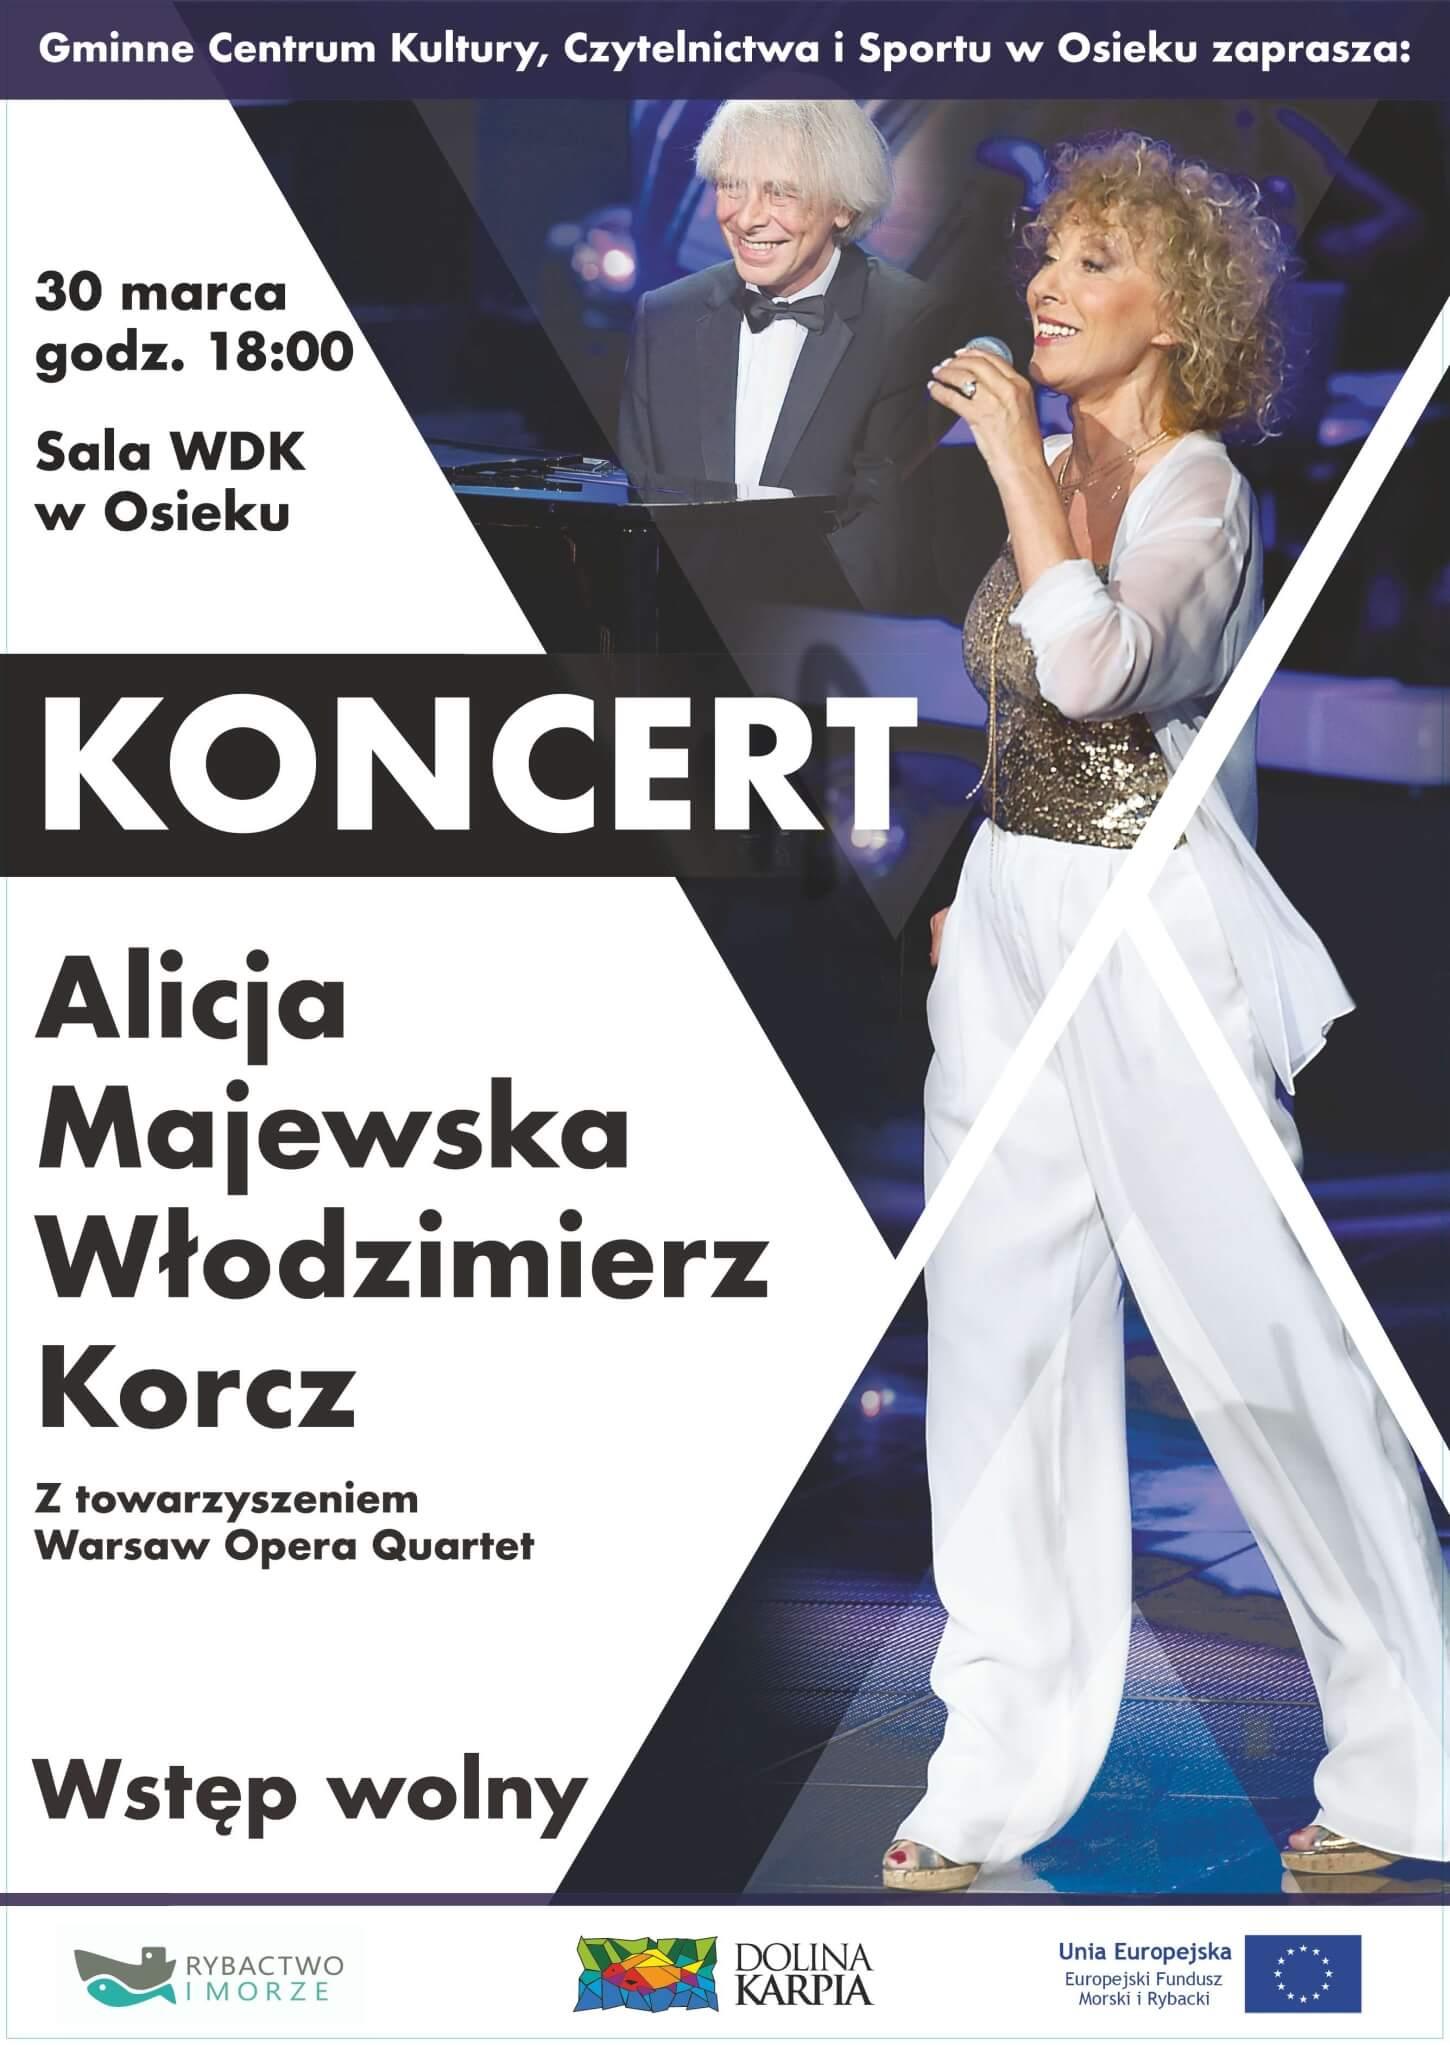 Alicja Majewska Plakat